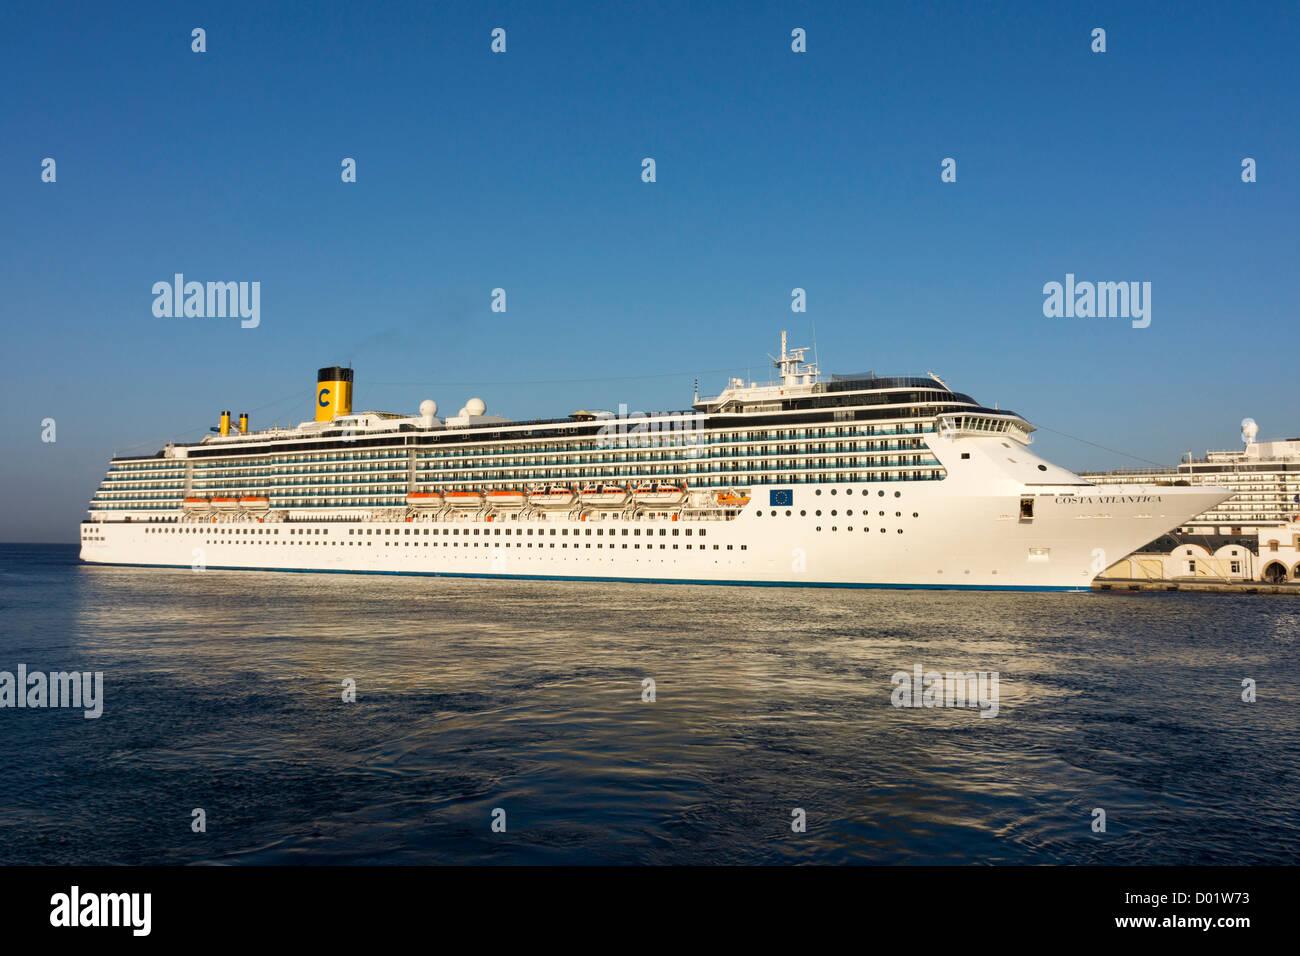 Cruise liners in Rhodes, Rhodos, harbour Costa Atlantica - Stock Image